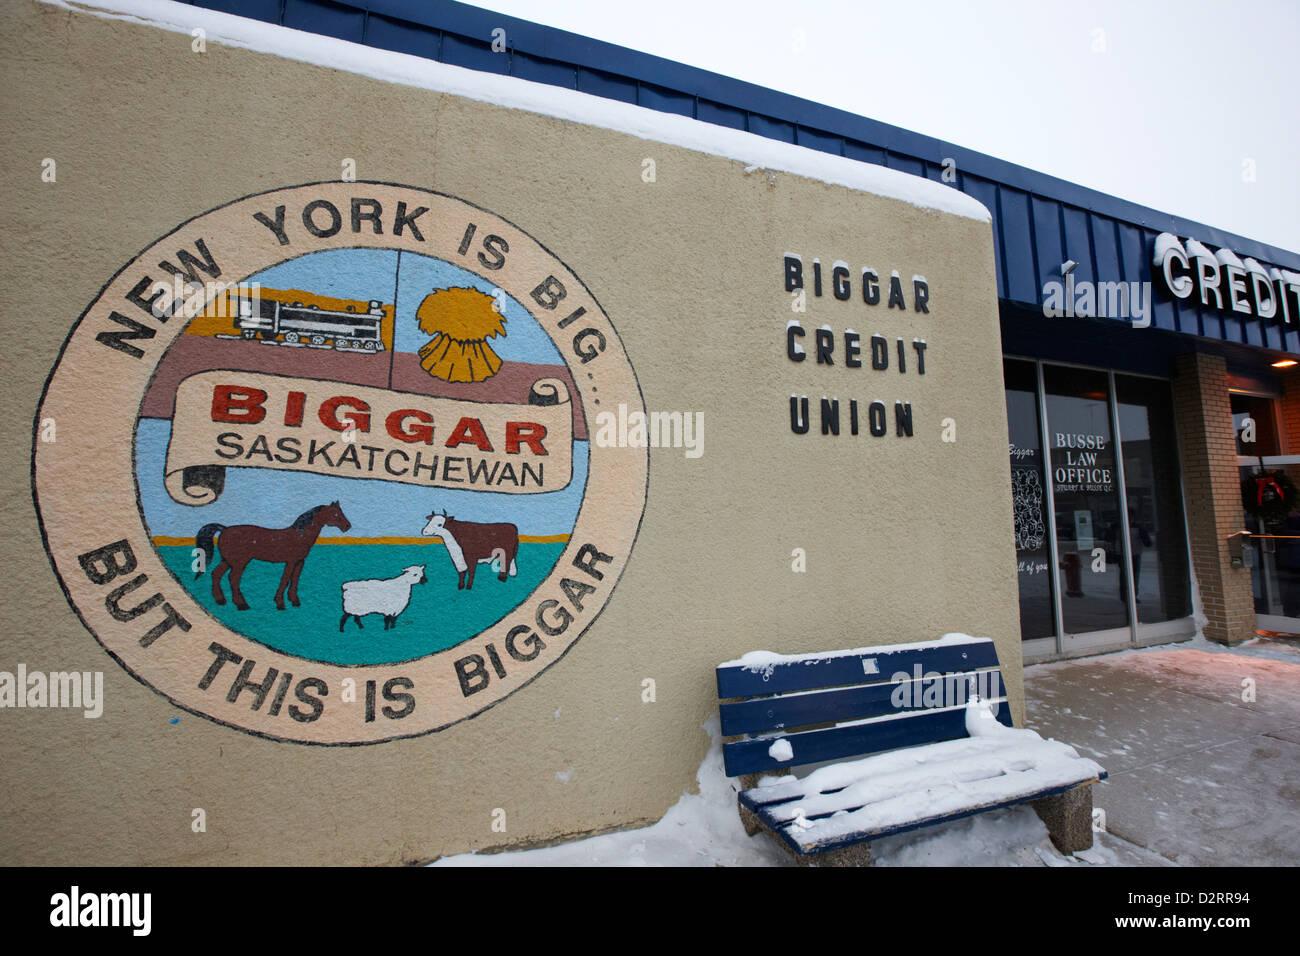 new york is big but this is biggar slogan sign Biggar credit union Saskatchewan Canada - Stock Image